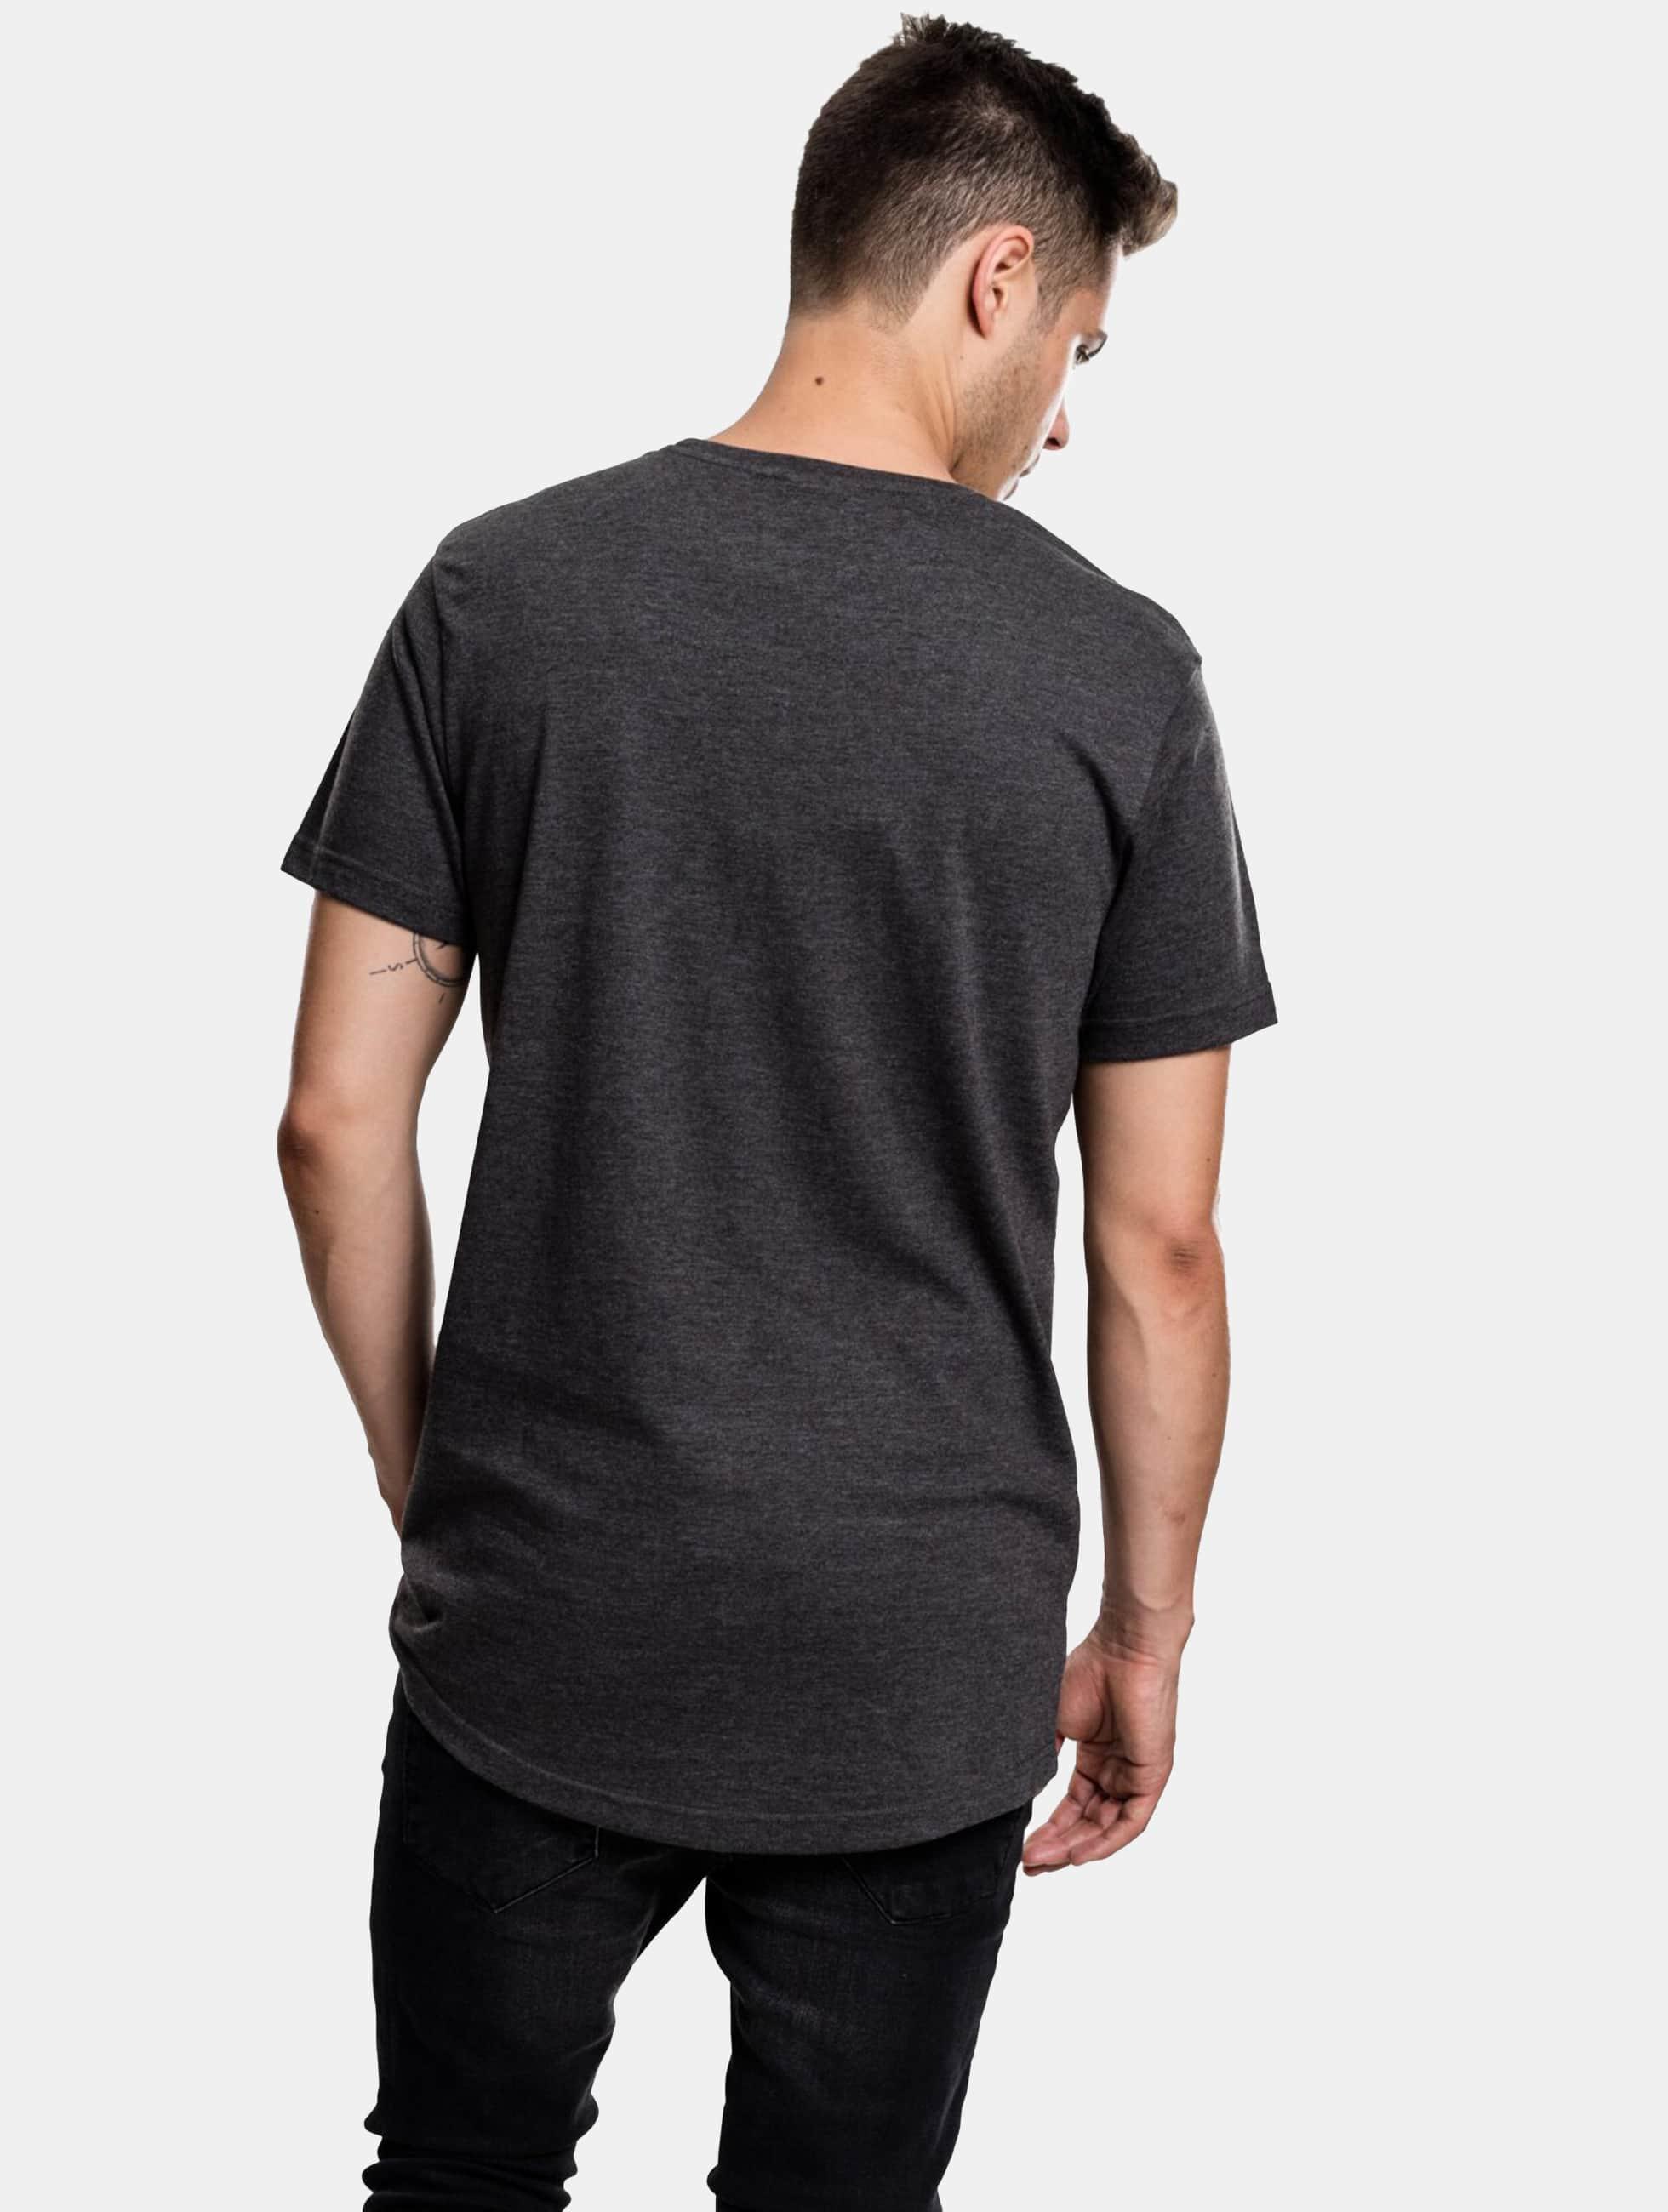 Urban Classics Tall Tees Shaped Melange Oversized Long gray